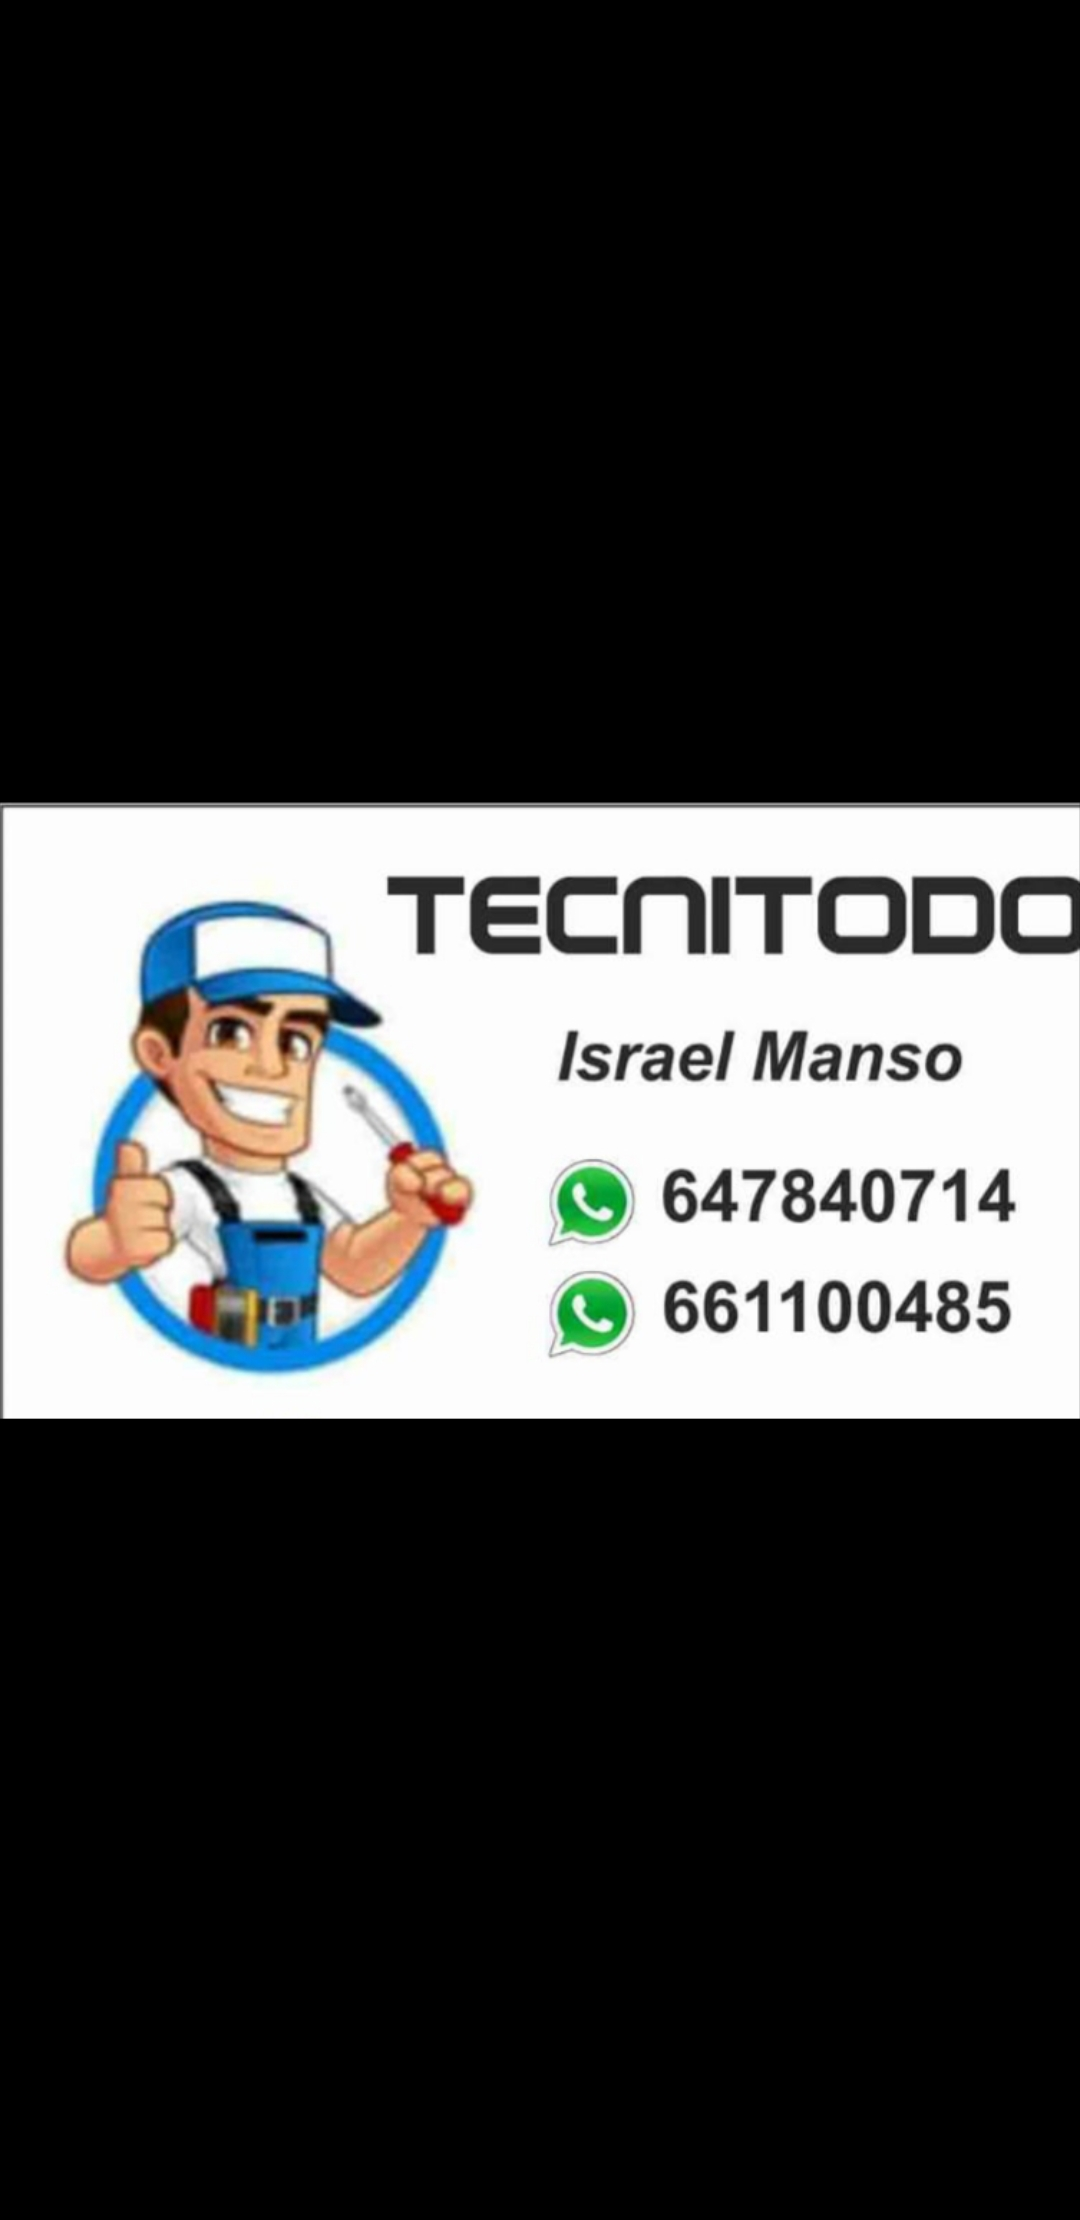 Israel Manso